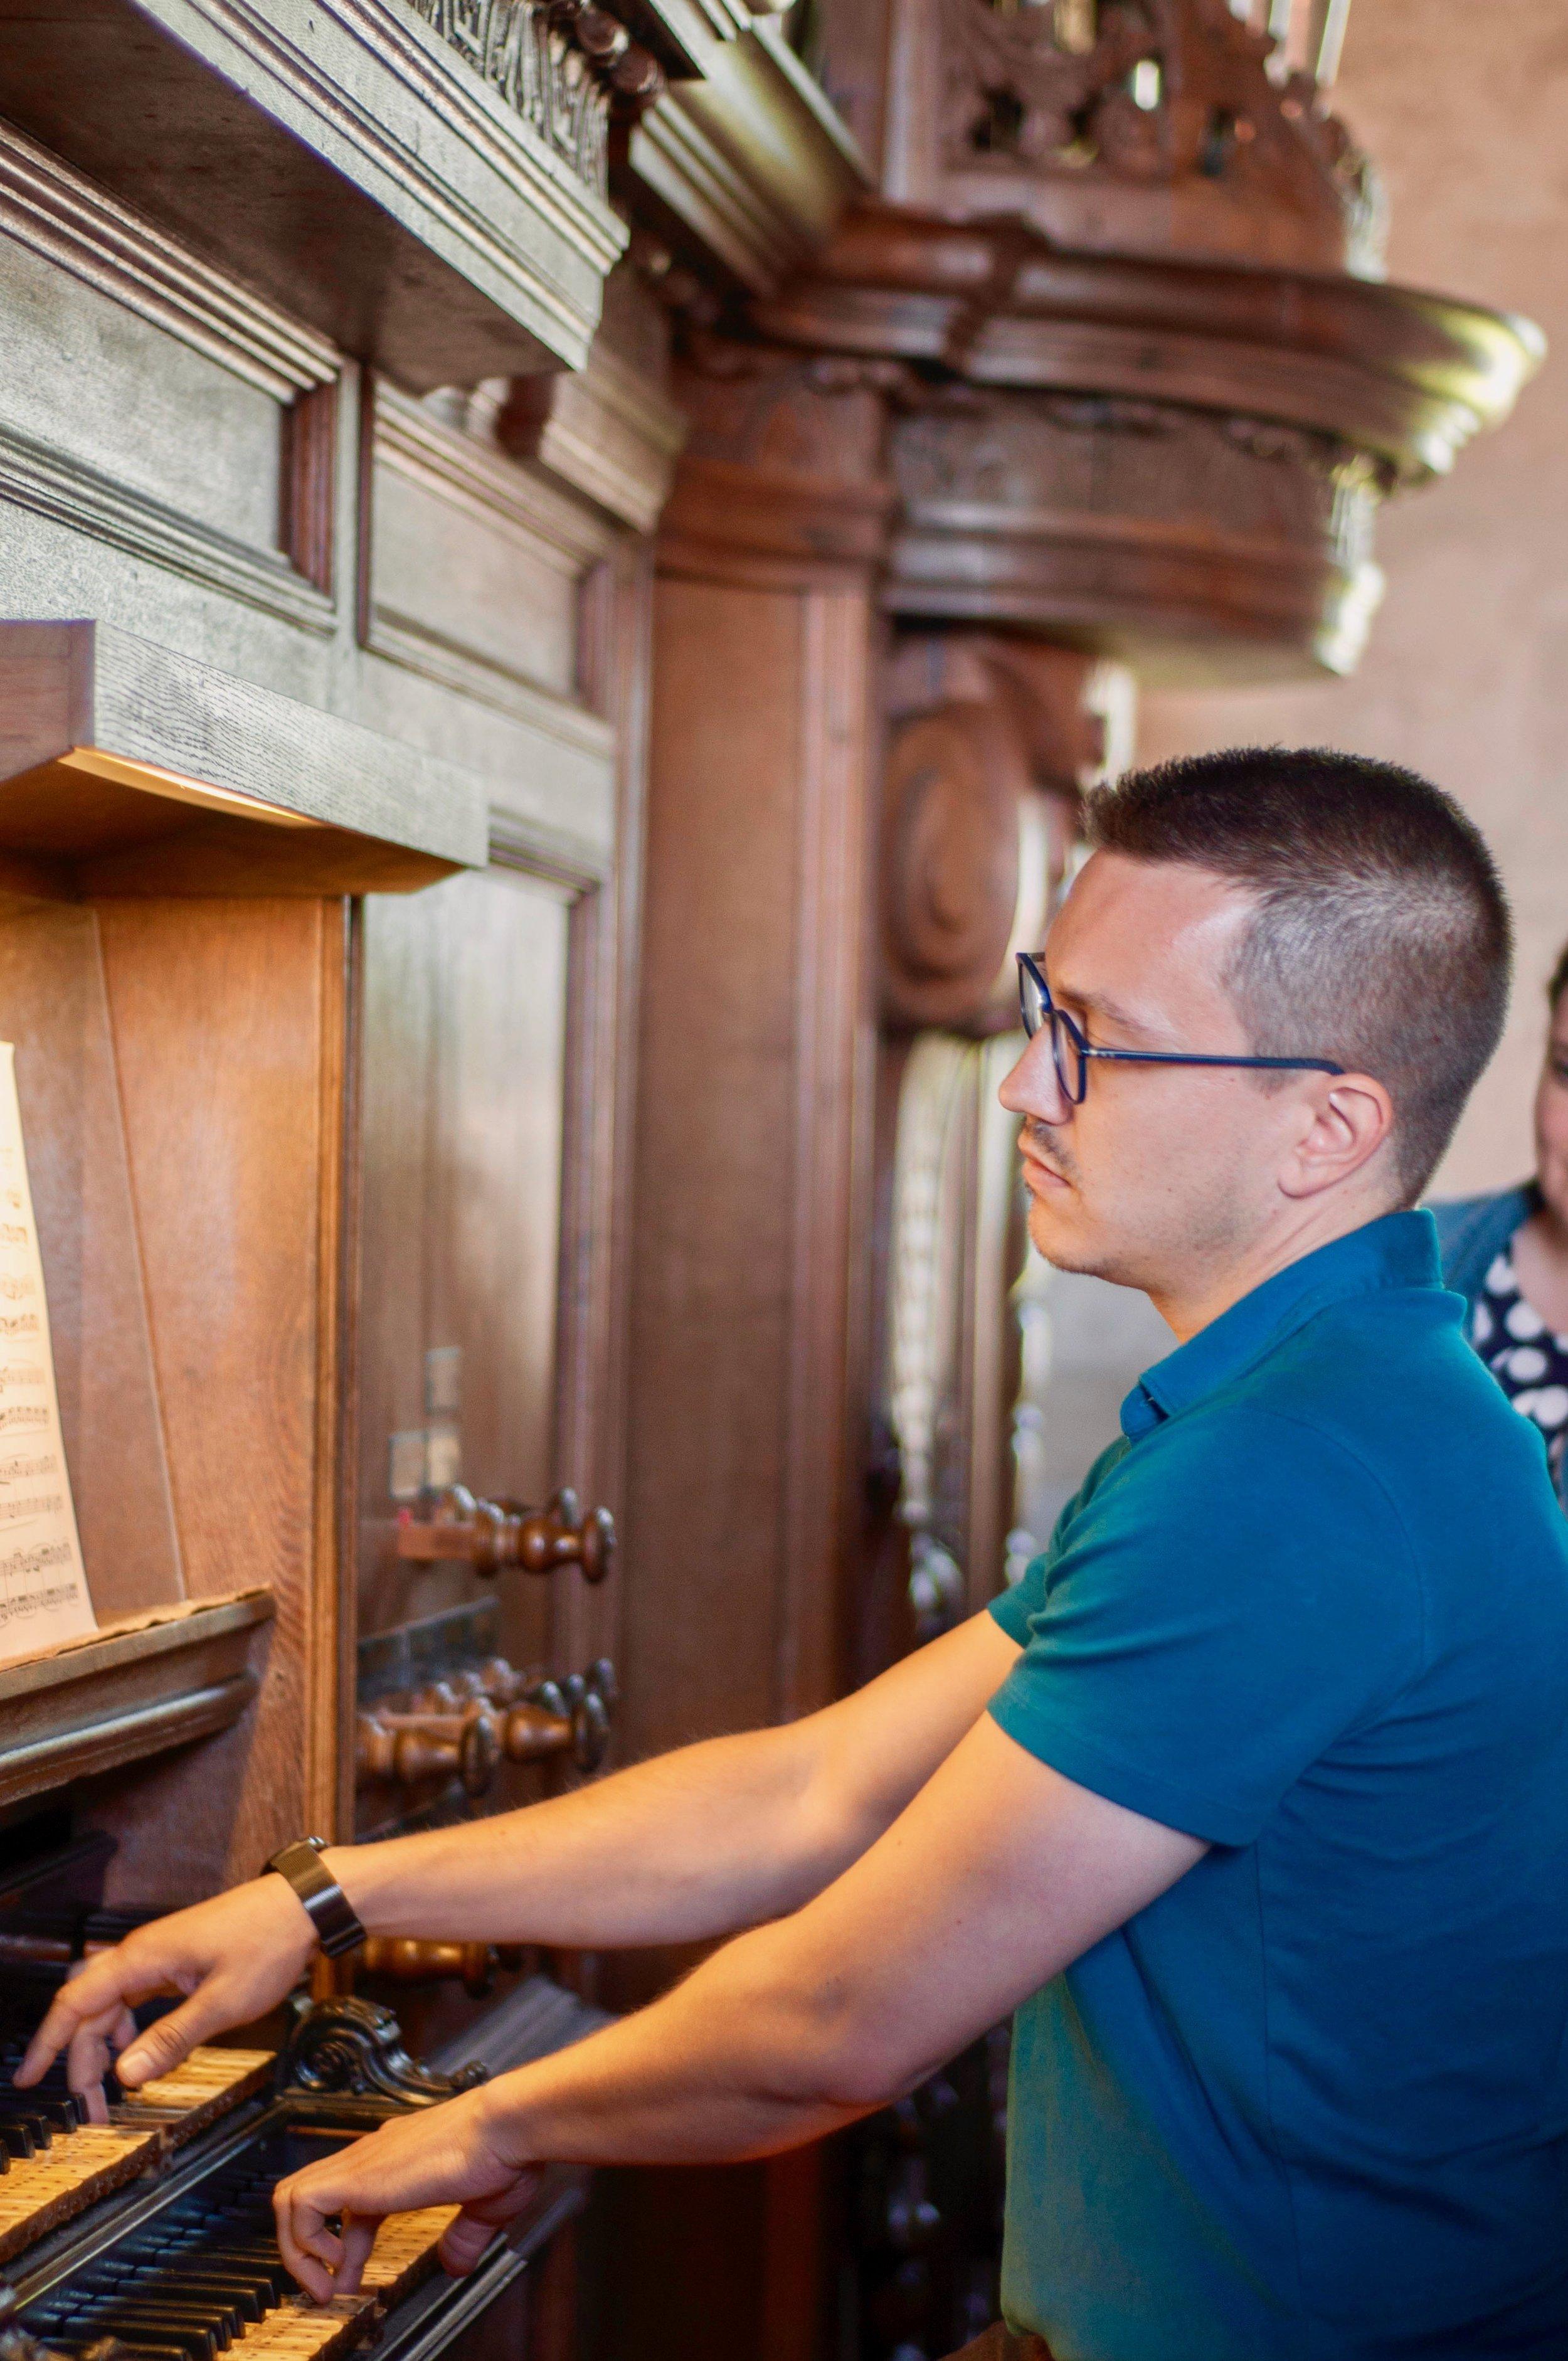 Corey De Tar plays the 1733 Hinsz organ in Leens, Holland.